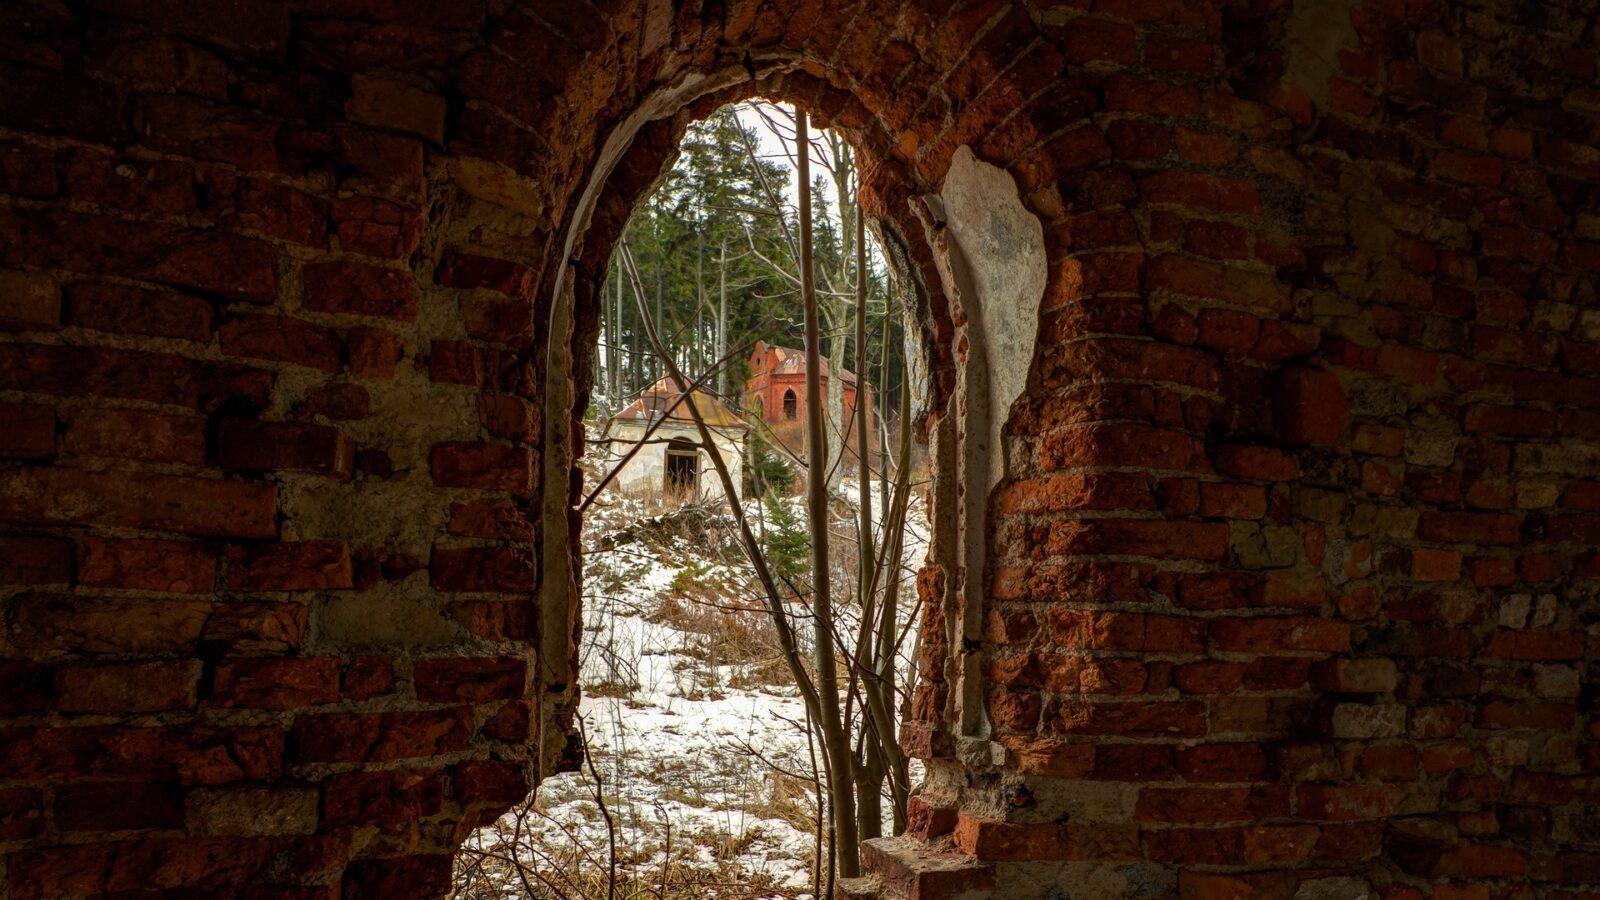 Okno wkaplicy IV - widok nakaplice V iVI - Święta Góra